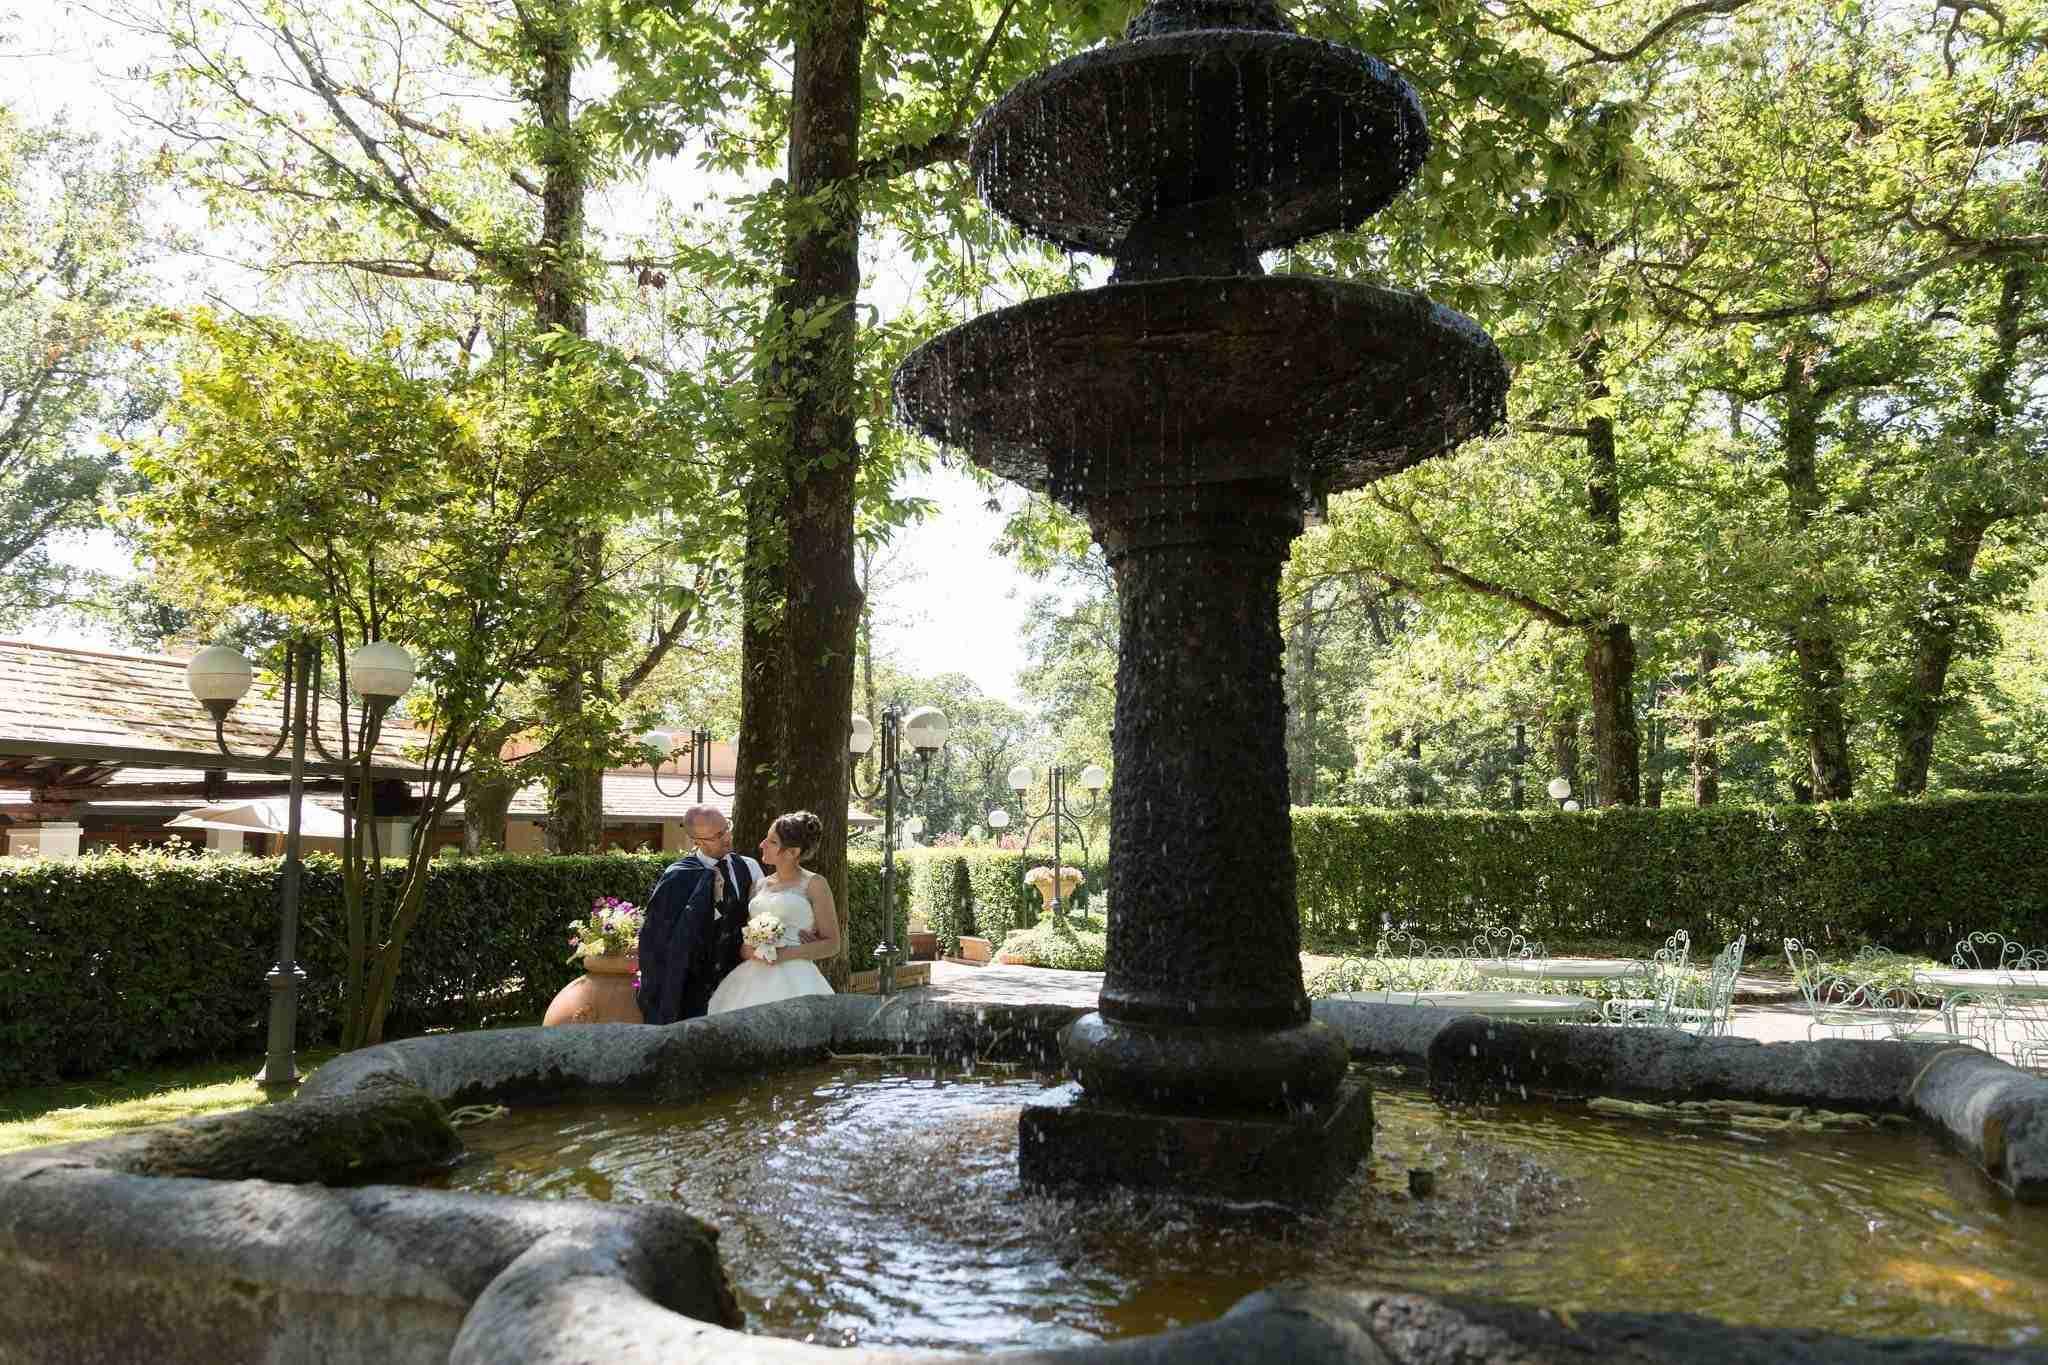 Matrimonio al ristorante la Foresta: fontana